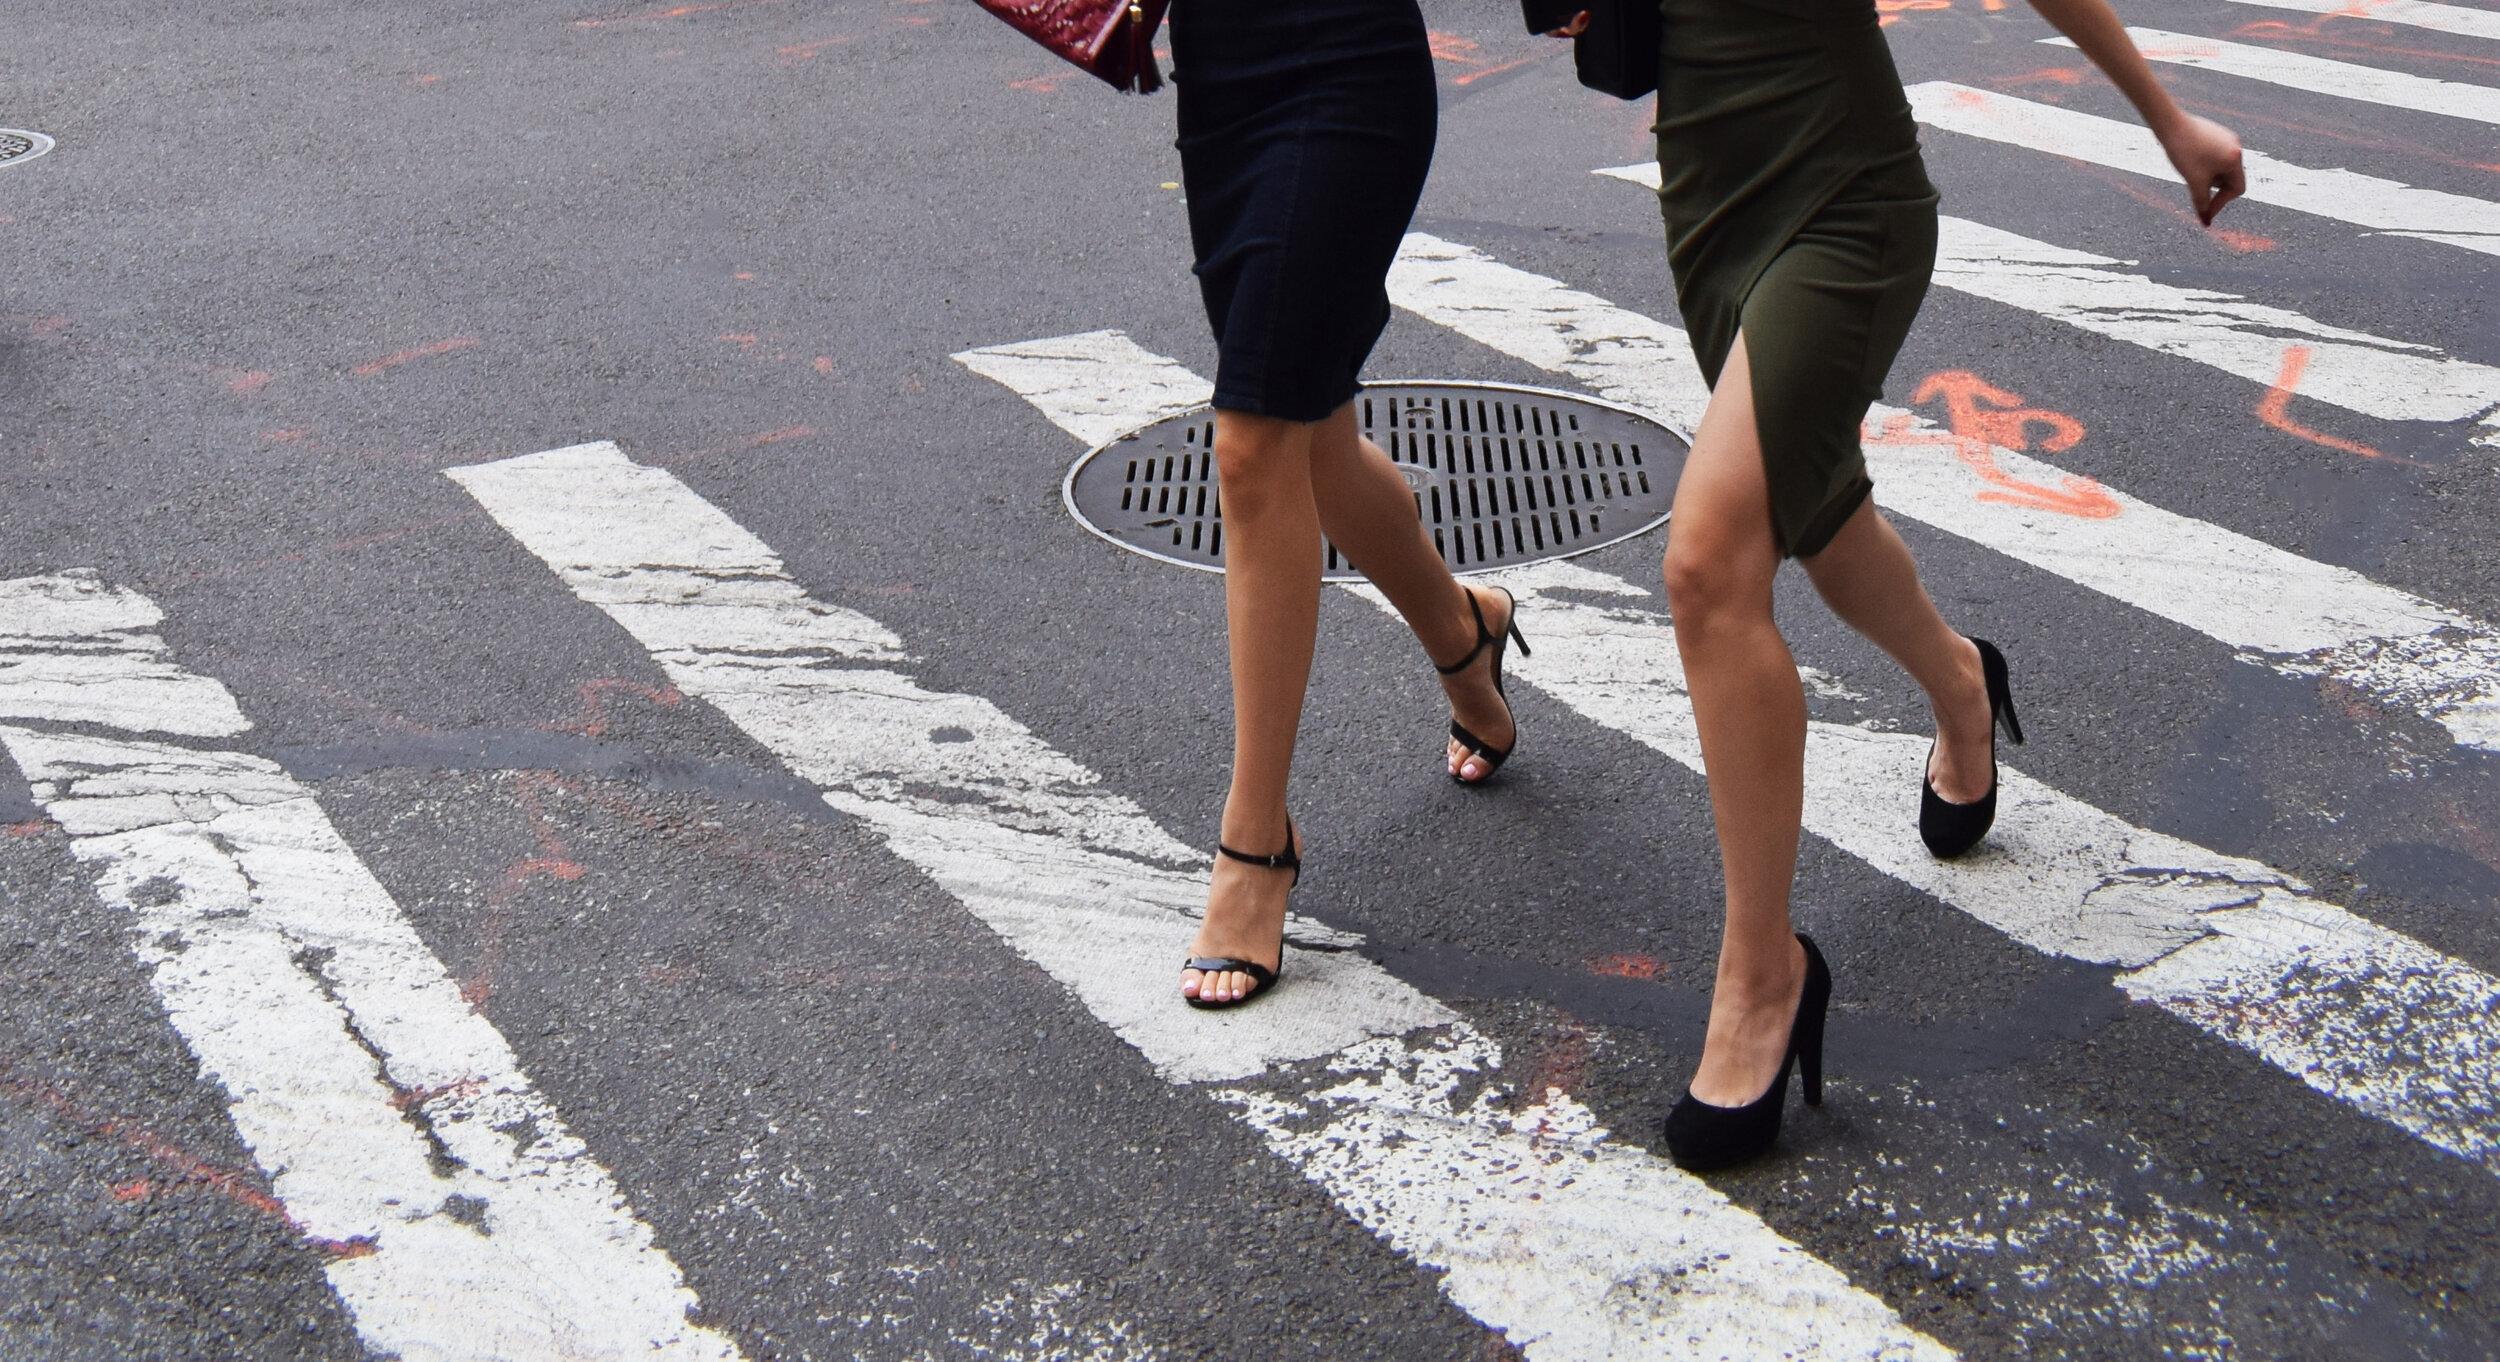 Snapshot of women in professional dress crossing a street